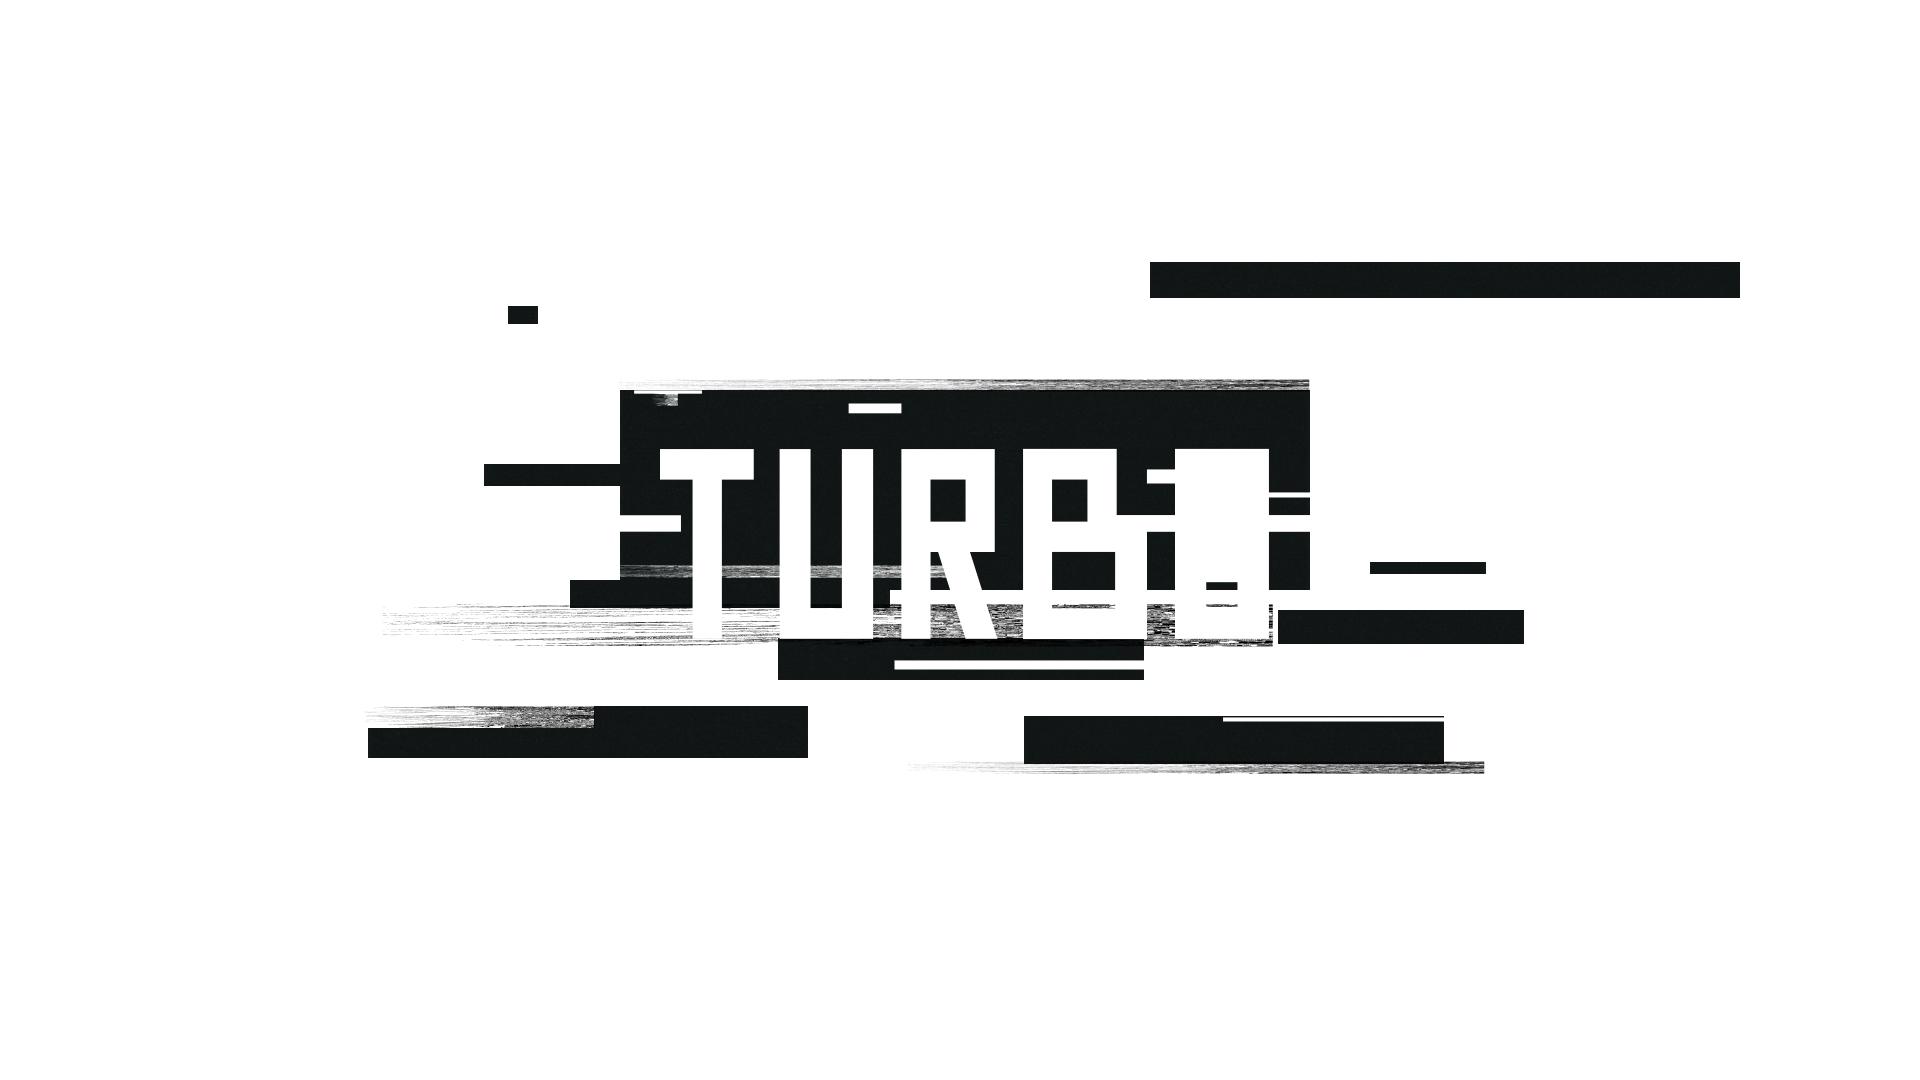 Turbo_D2_04.jpg